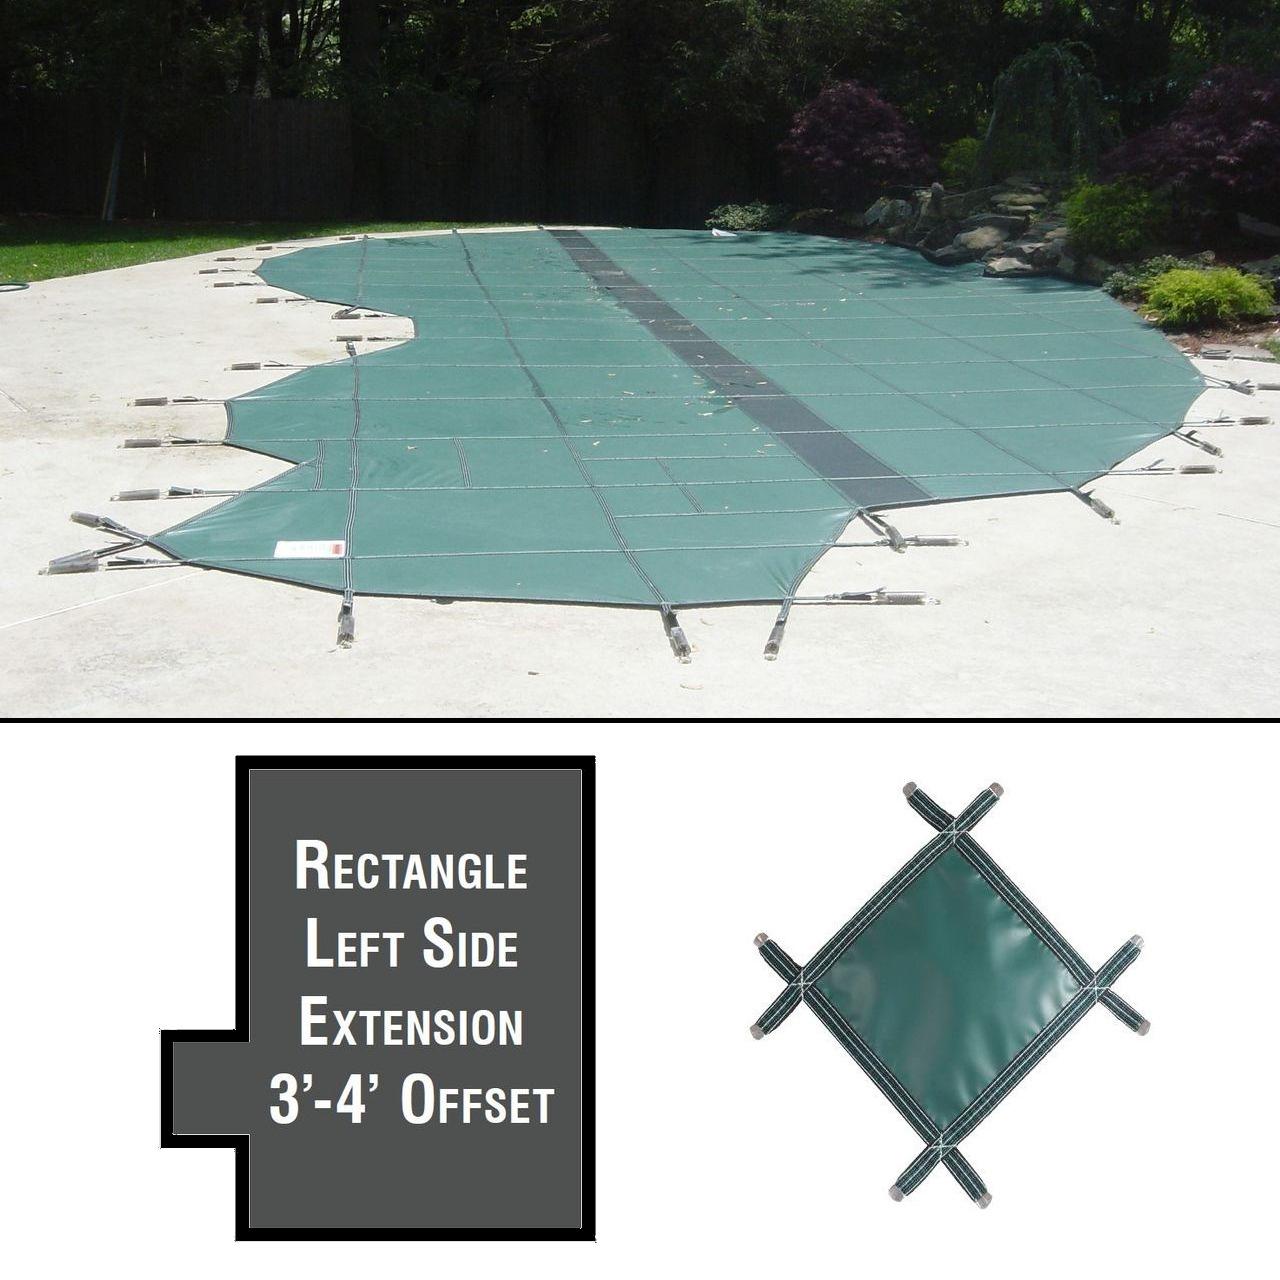 PermaGuard 22'x42' Rectangular Pool Cover Plus Left Ext 4' Offset